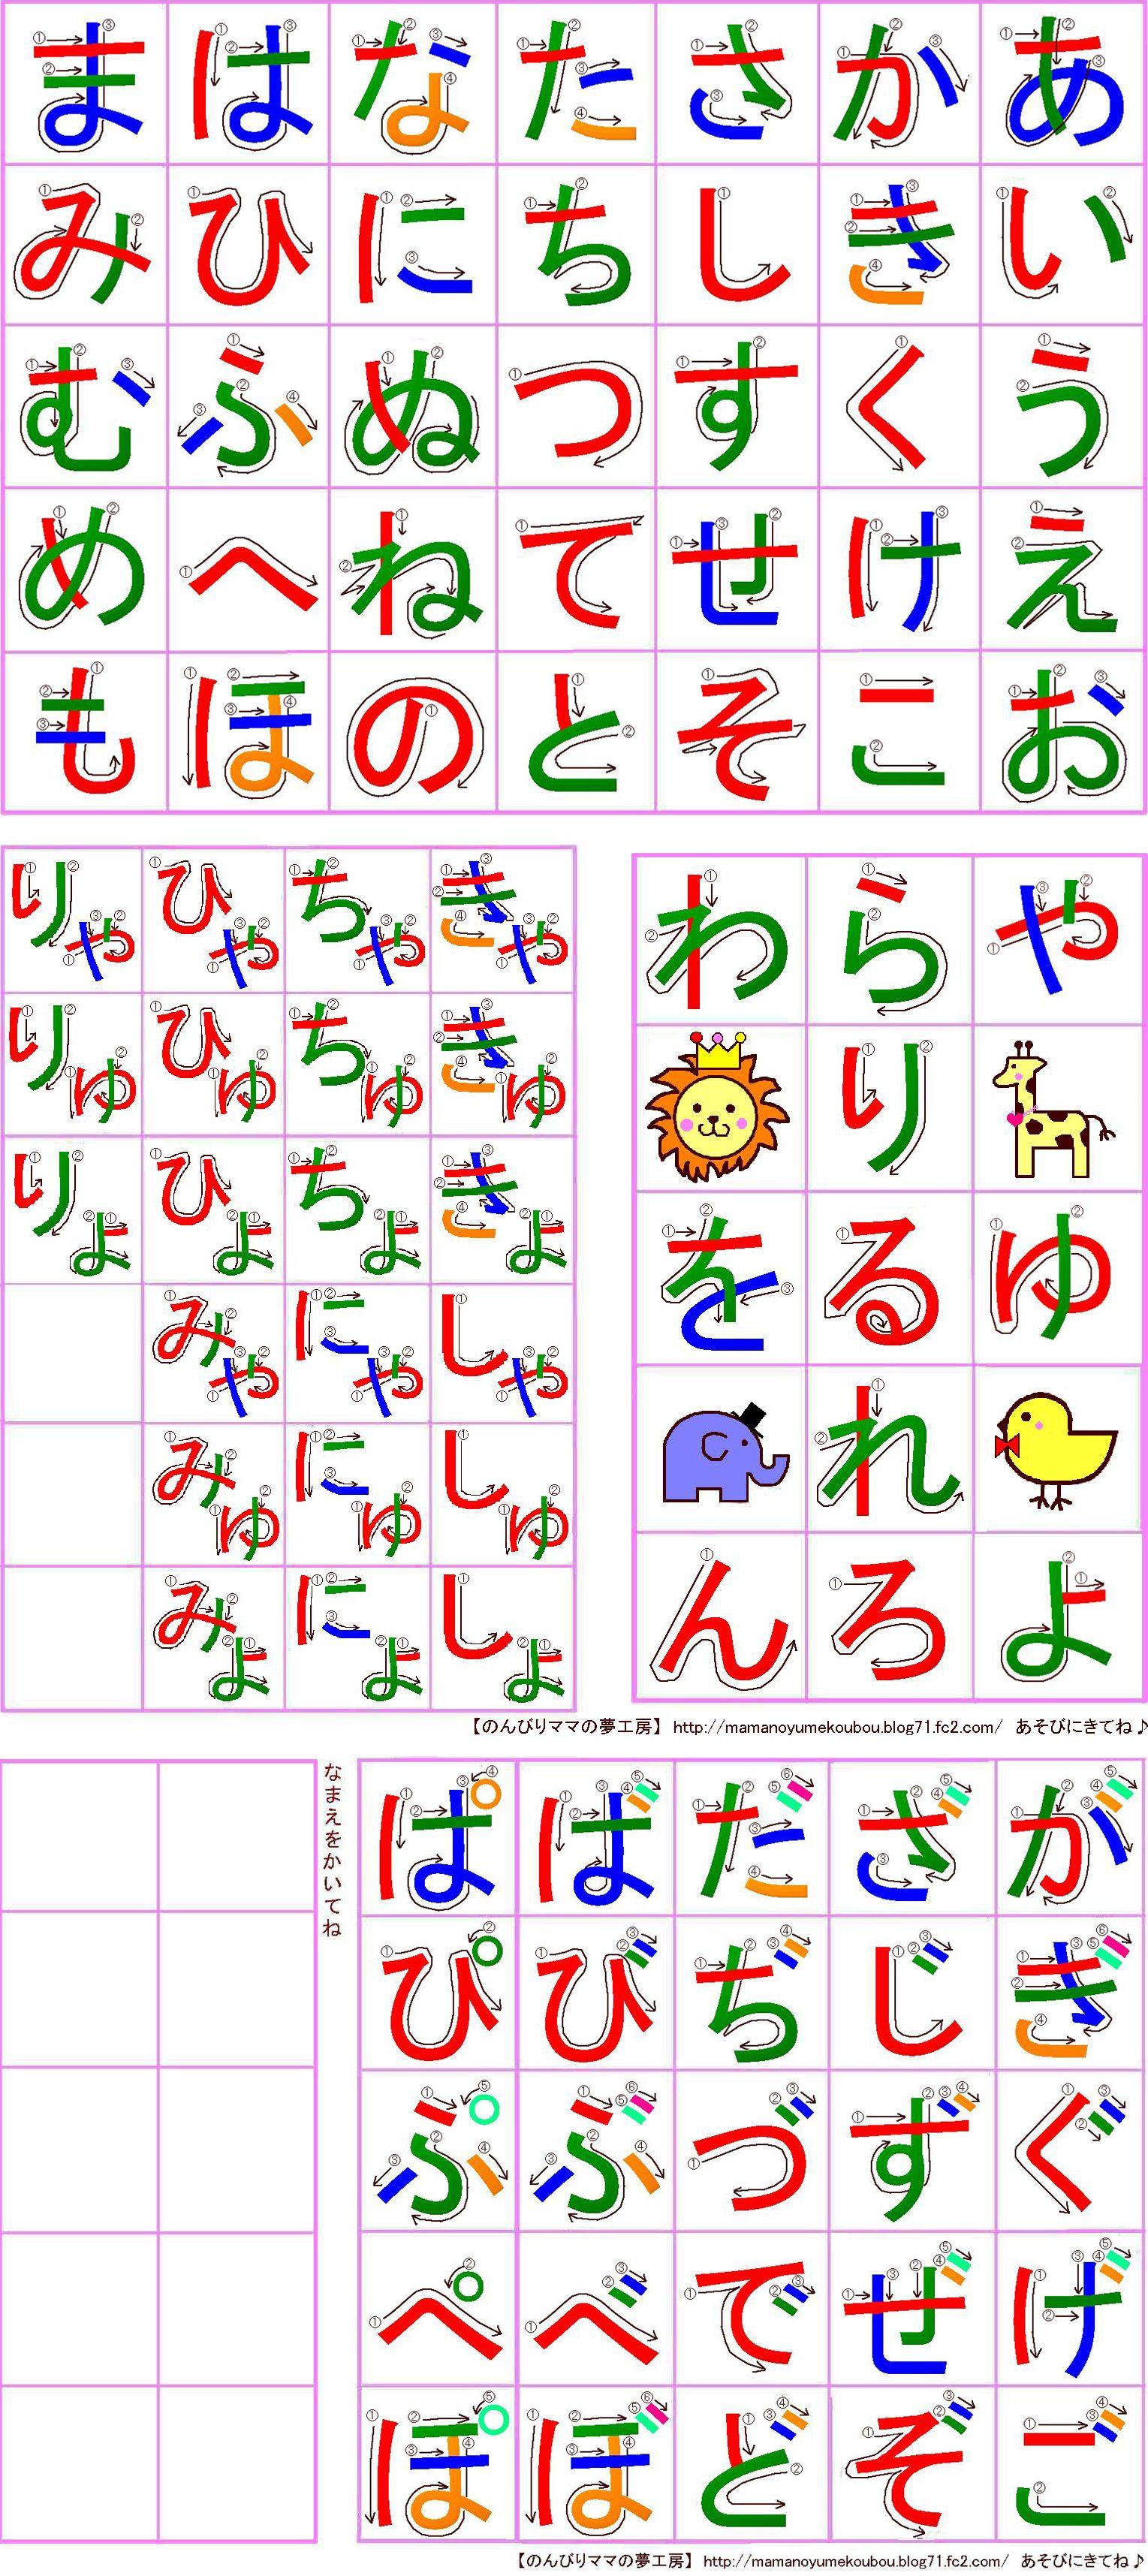 stroke order diagram schematic diagram database kanji colorizer stroke order diagrams kanji stroke diagram [ 1529 x 3431 Pixel ]